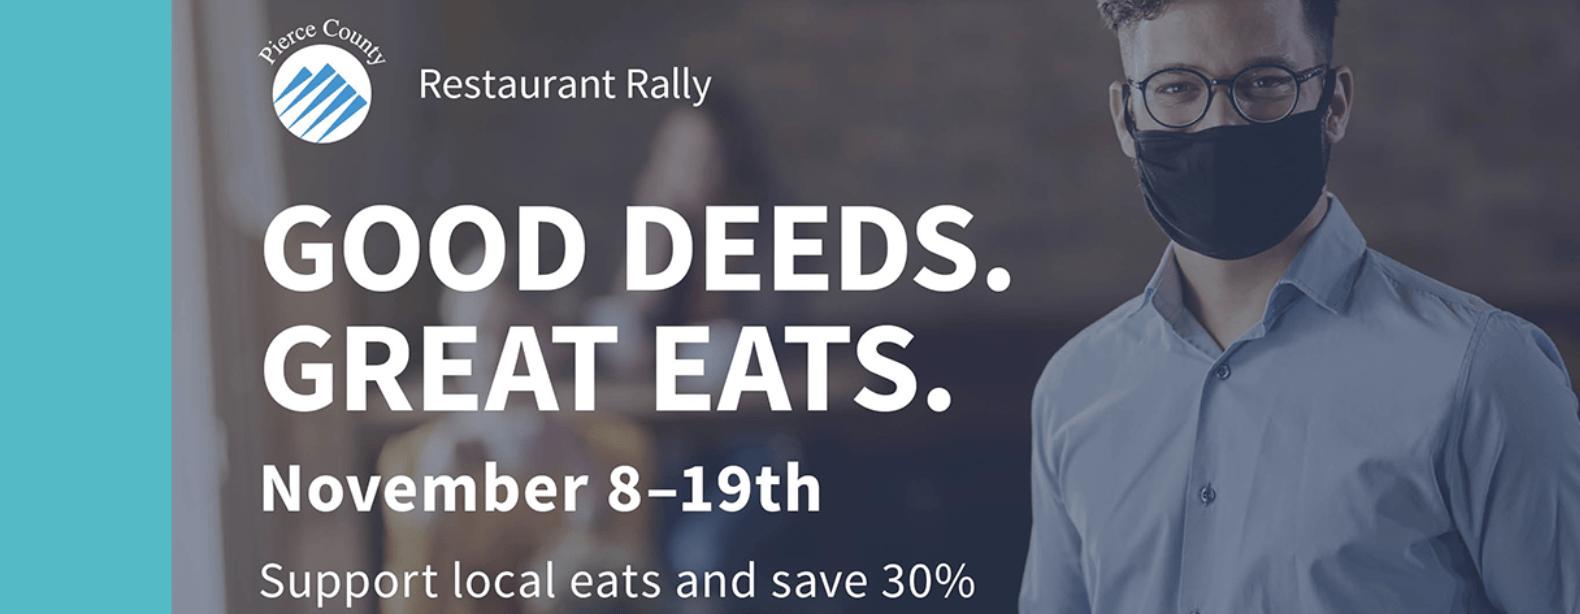 Pierce County Restaurant Rally